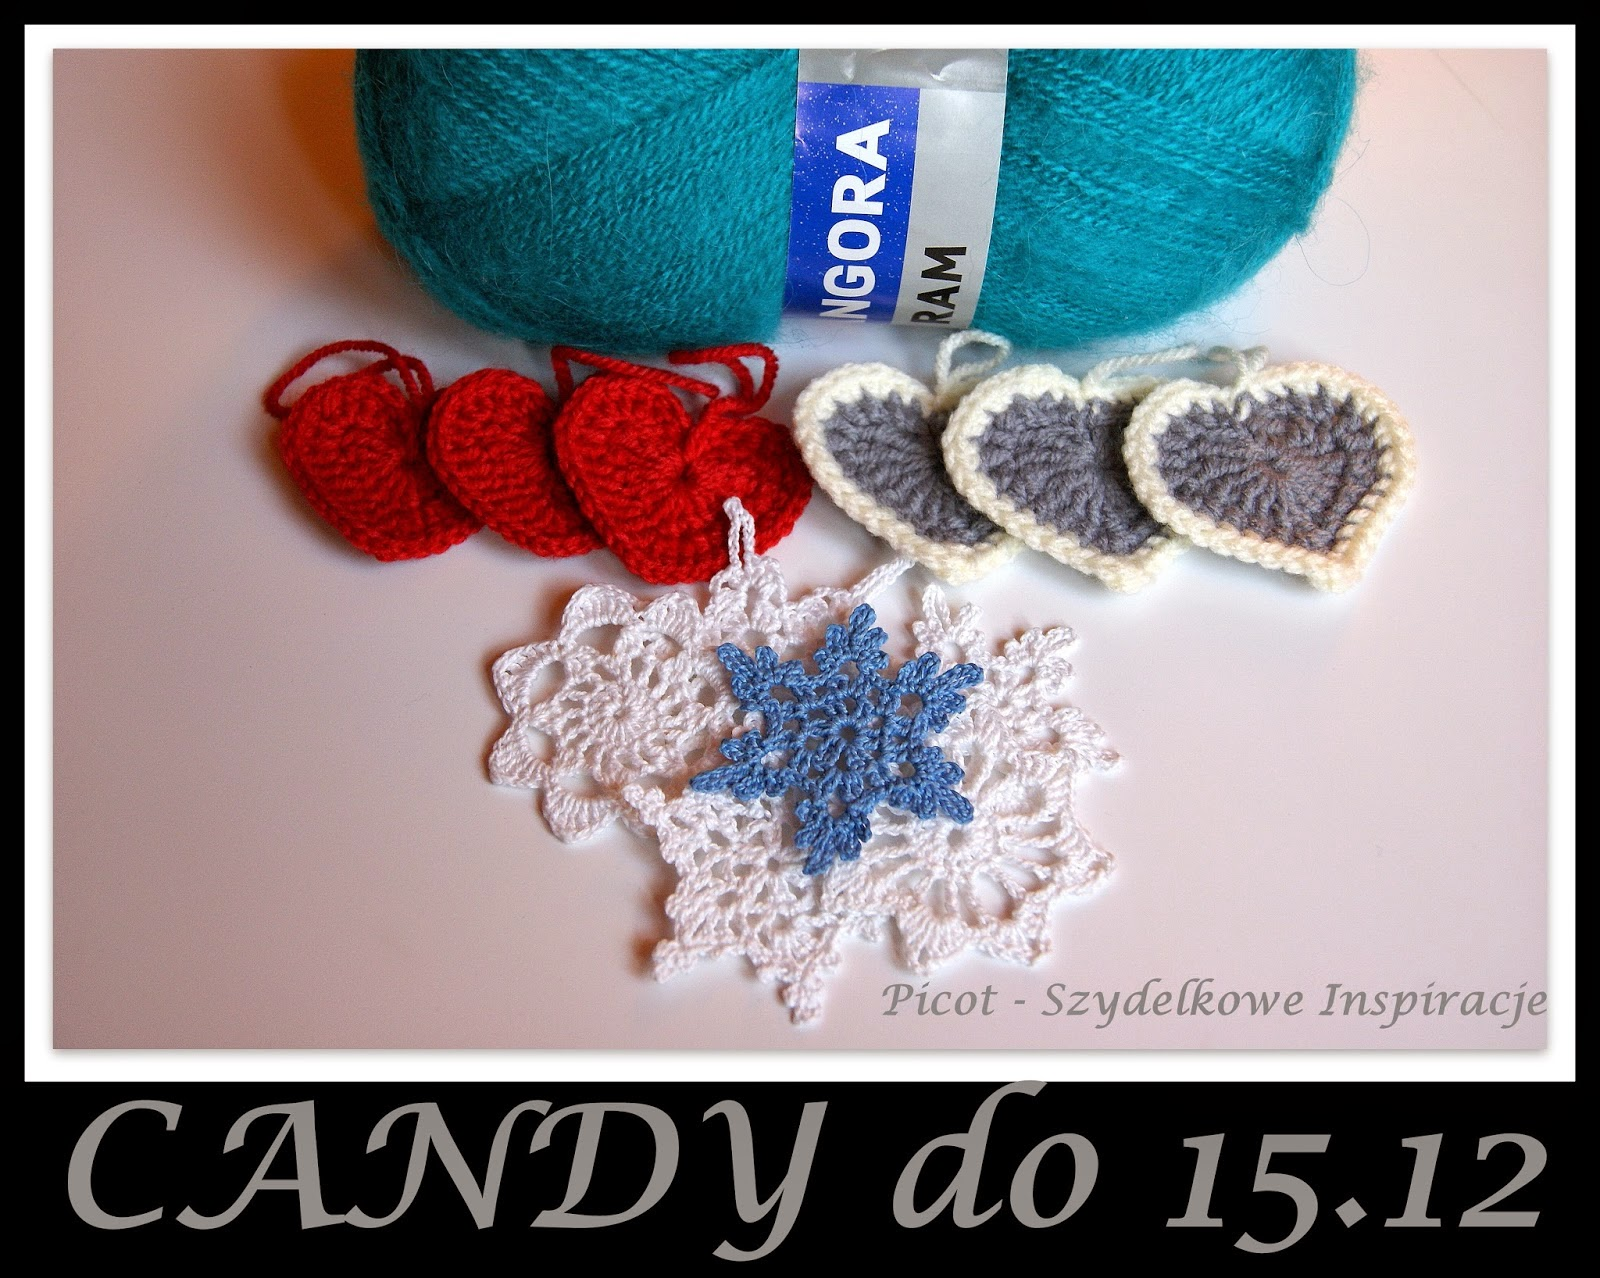 http://picot-picot.blogspot.com/2014/11/pierwsze-candy.html